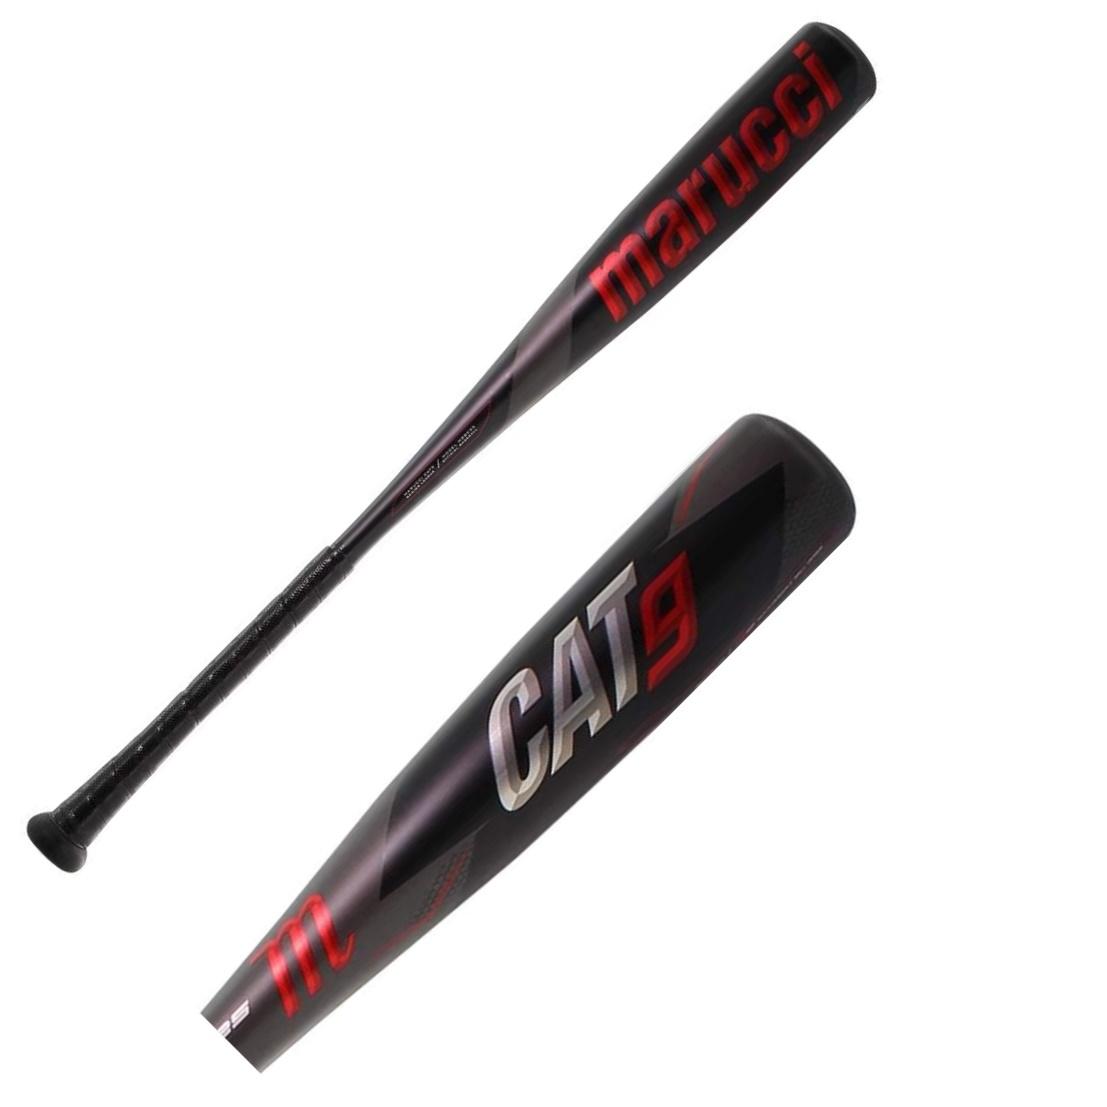 marucci-cat-9-8-usssa-baseball-bat-28-in-20-oz MSBC98-2820 Marucci  Utilizing a three-stage thermal treatment process our new AZR alloy offers